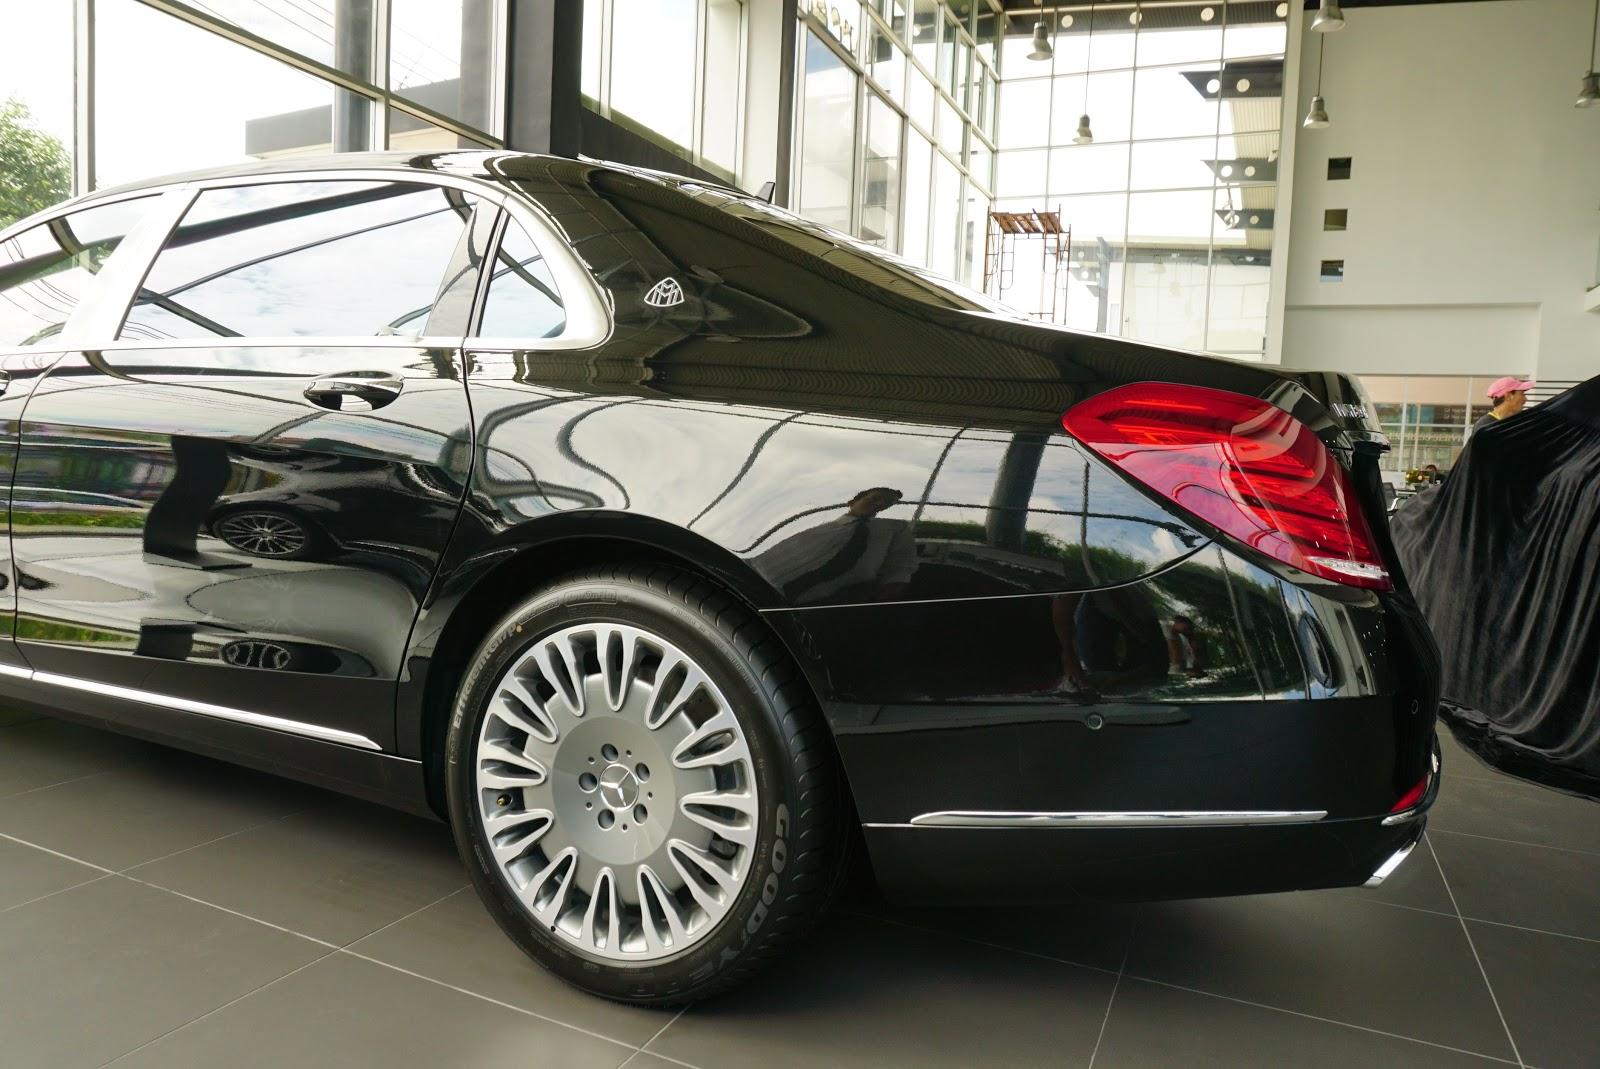 Ngoại Thất Xe Mercedes Benz S600 MAYBACH Màu Đen a03